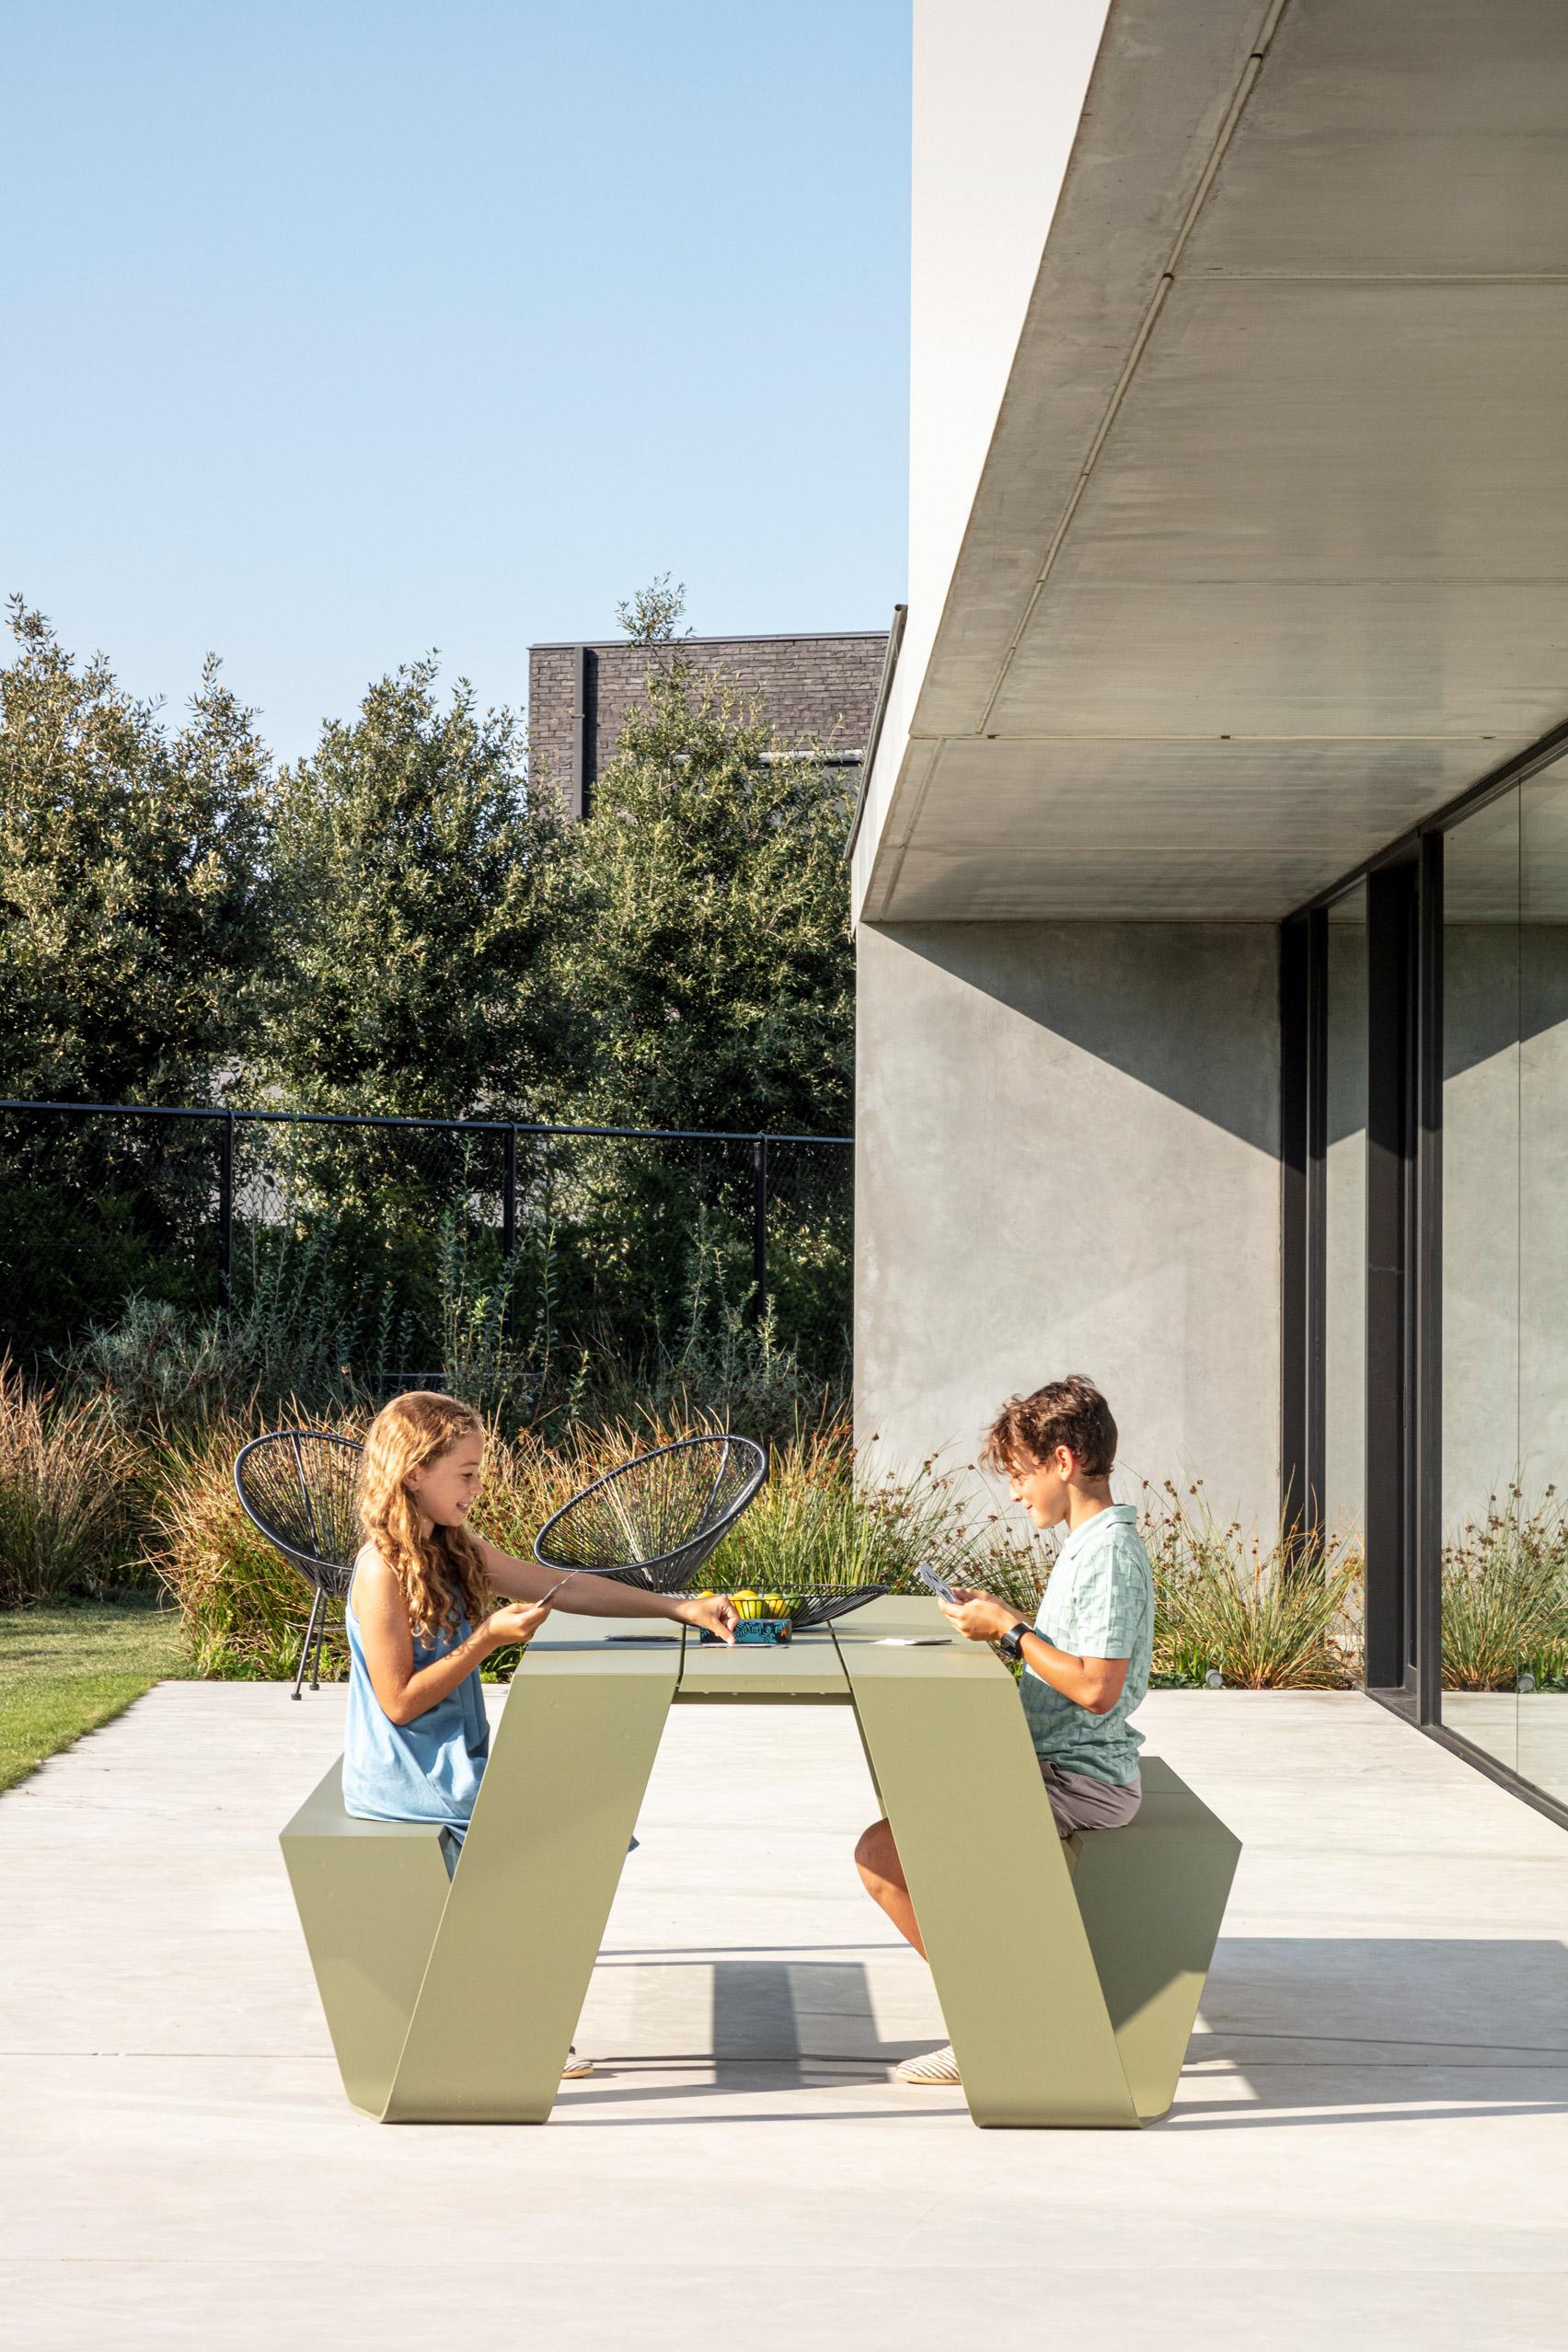 Aluminium picnic table called Hopper